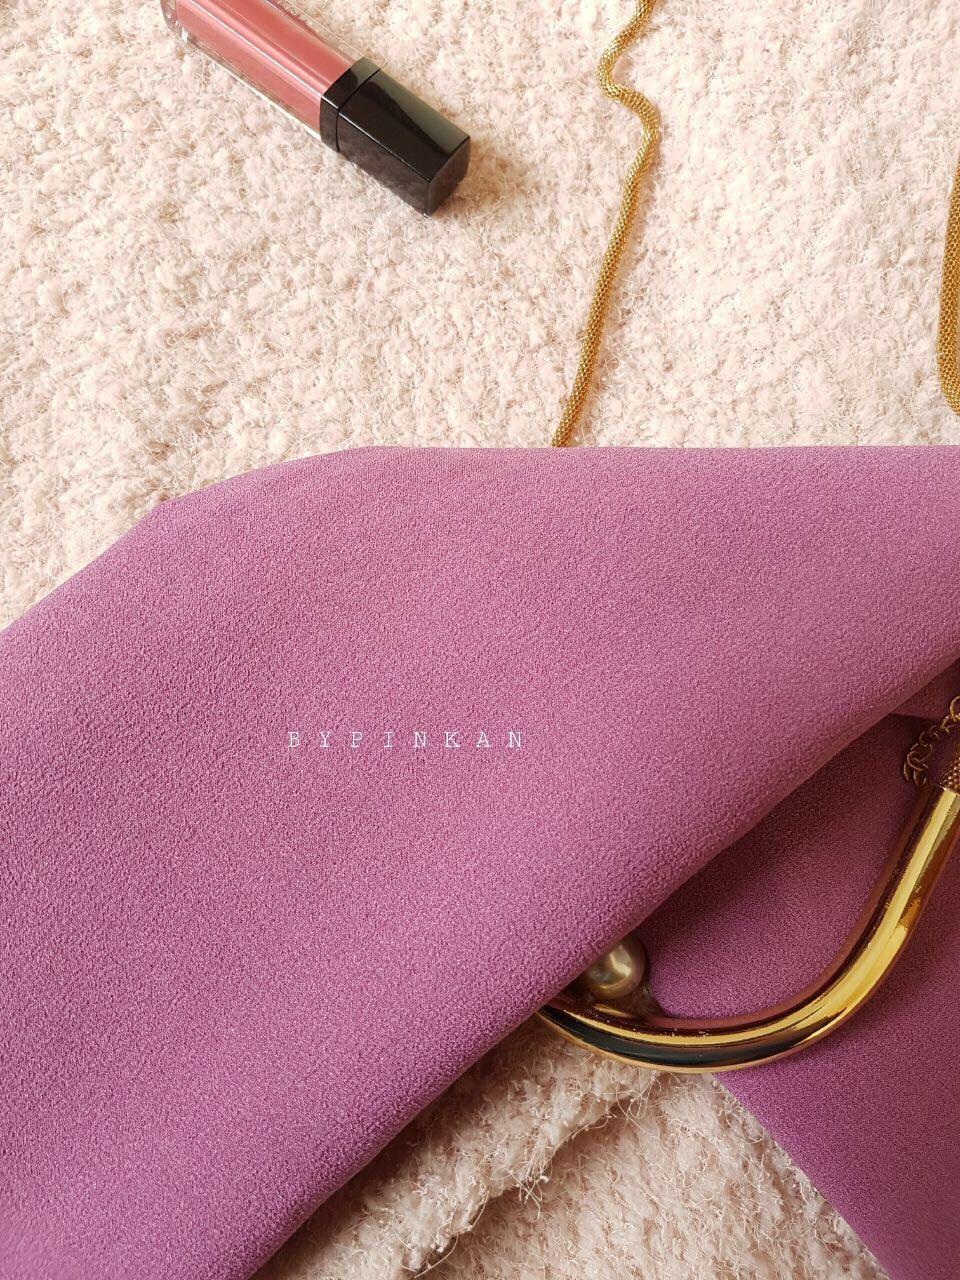 Pashmina Instant Jumbo Purple